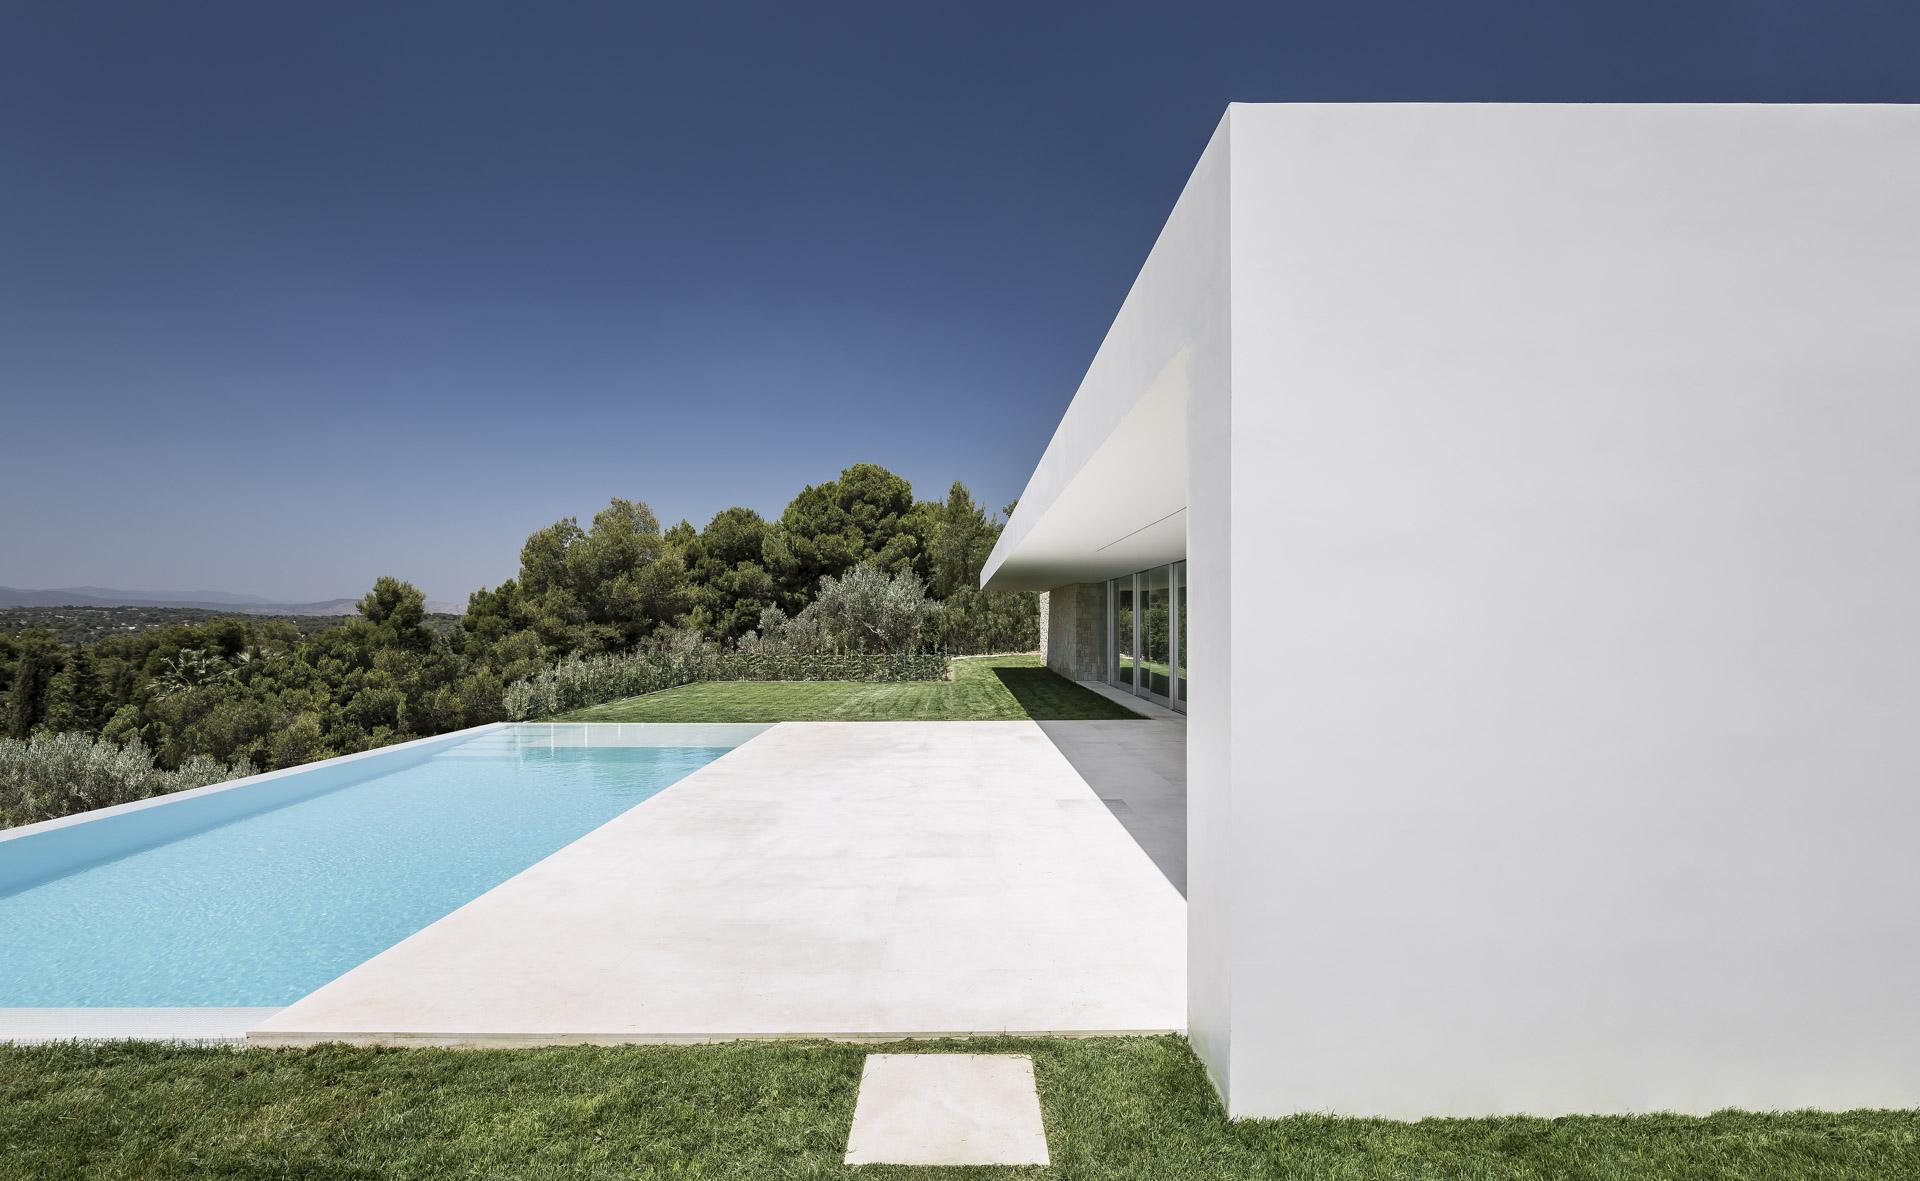 fotografia-arquitectura-valencia-german-cabo-gallardo-llopis-villamarchante-vivienda-18